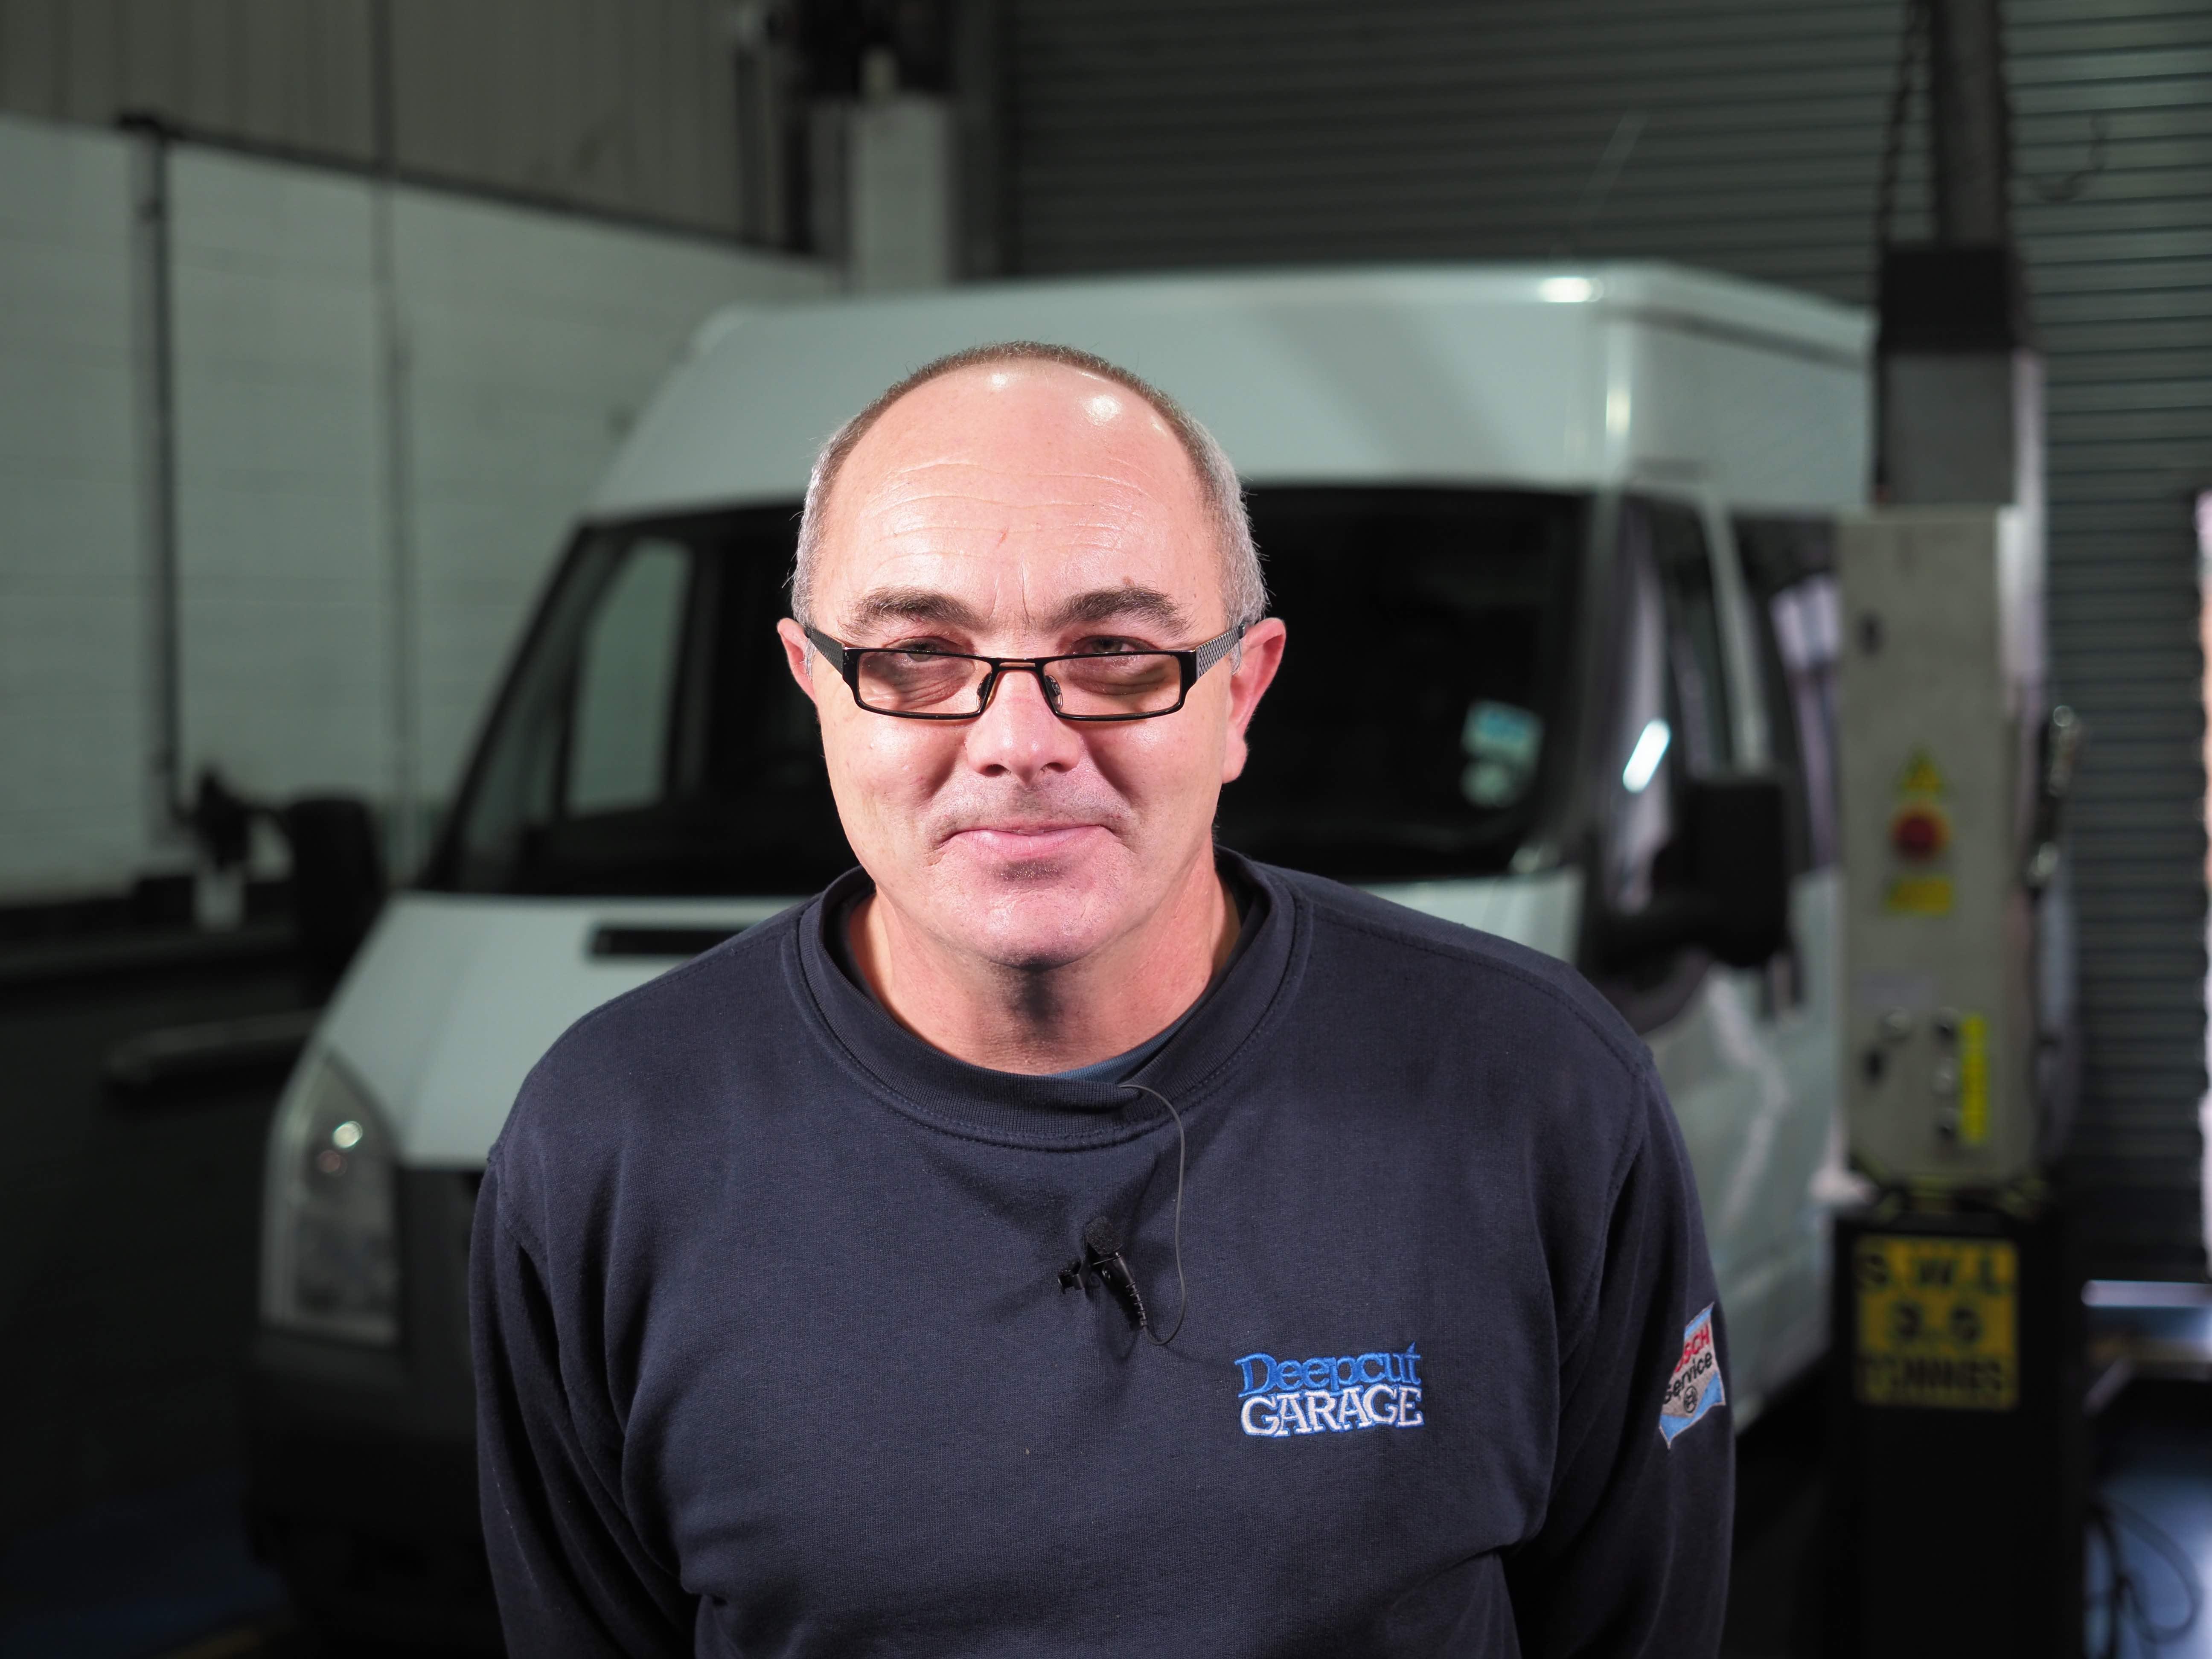 Steve - Deepcut Garage